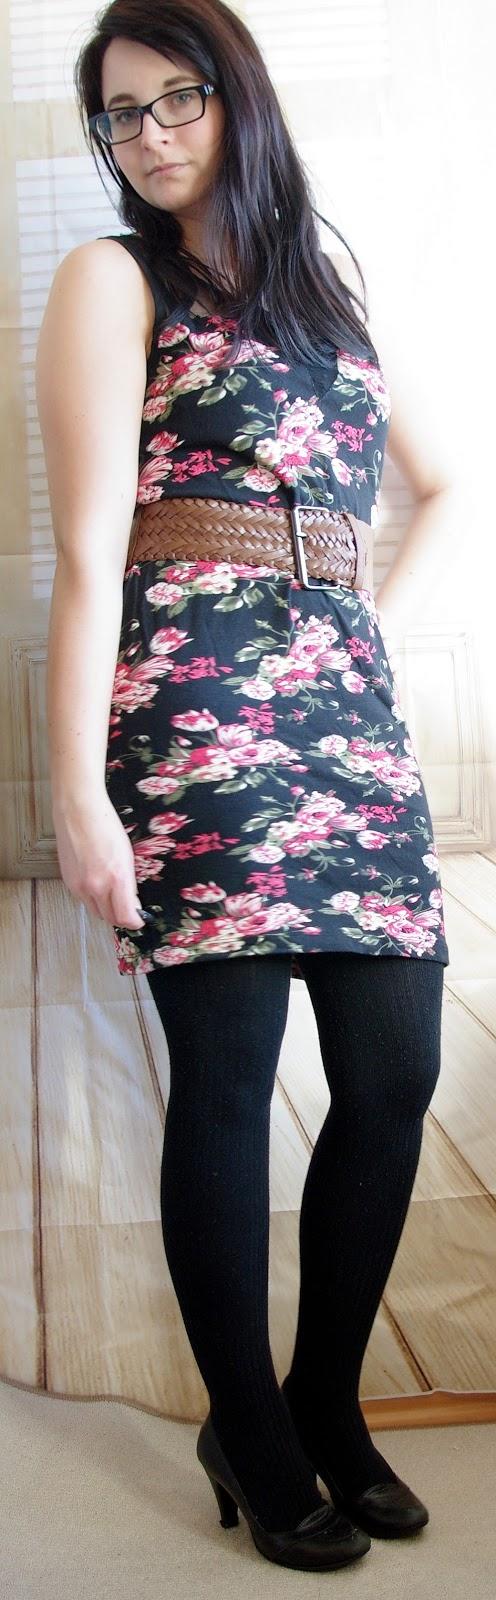 lucciola outfit bl mchen kleid mit strumpfhose und lederjacke winteroutfit. Black Bedroom Furniture Sets. Home Design Ideas